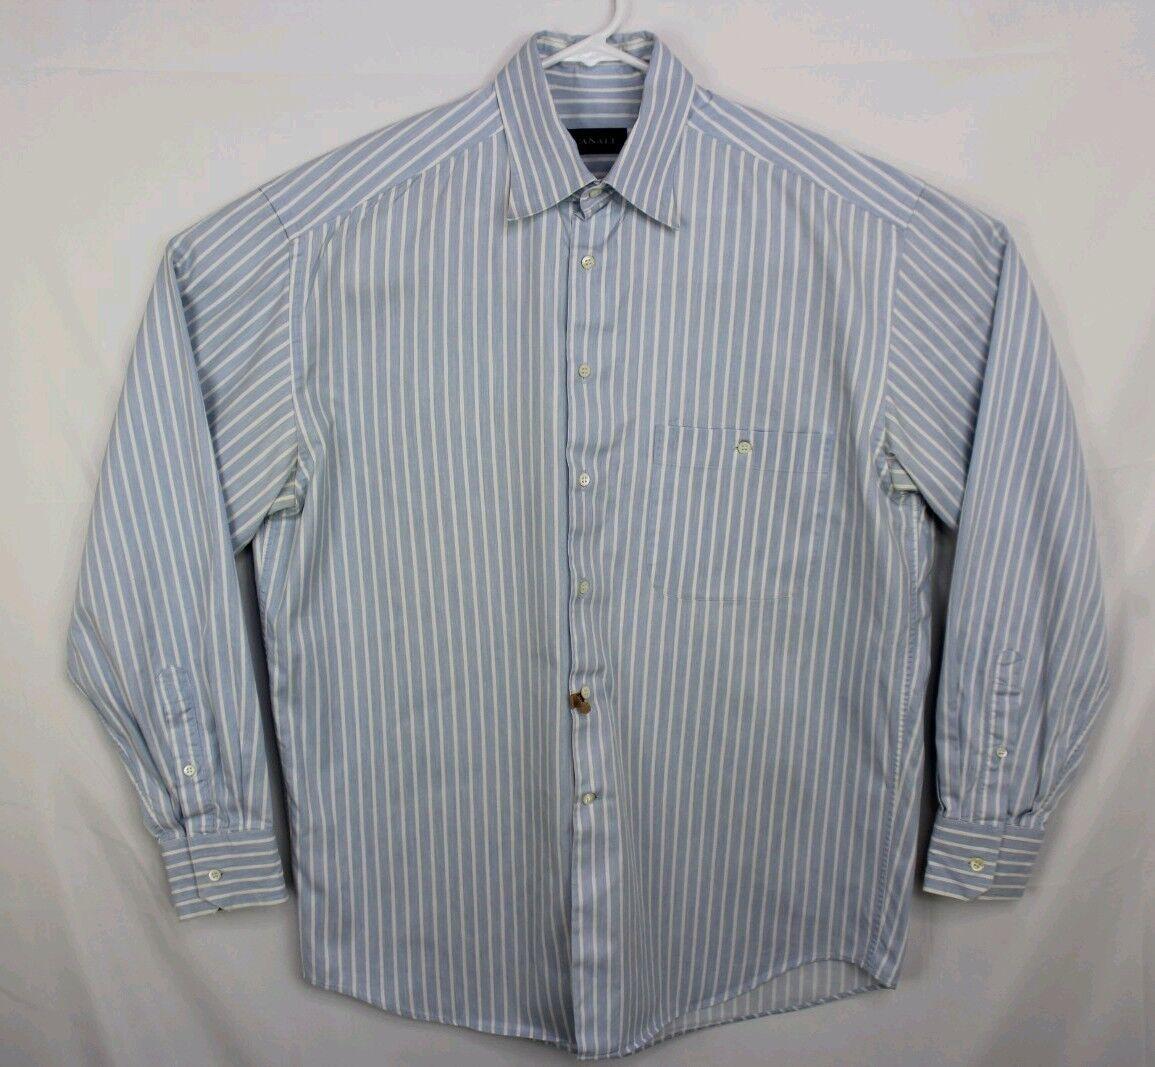 Canali  Button Down Collar Dress Shirt Blau Weiß Stripe 16-41 EUC B12